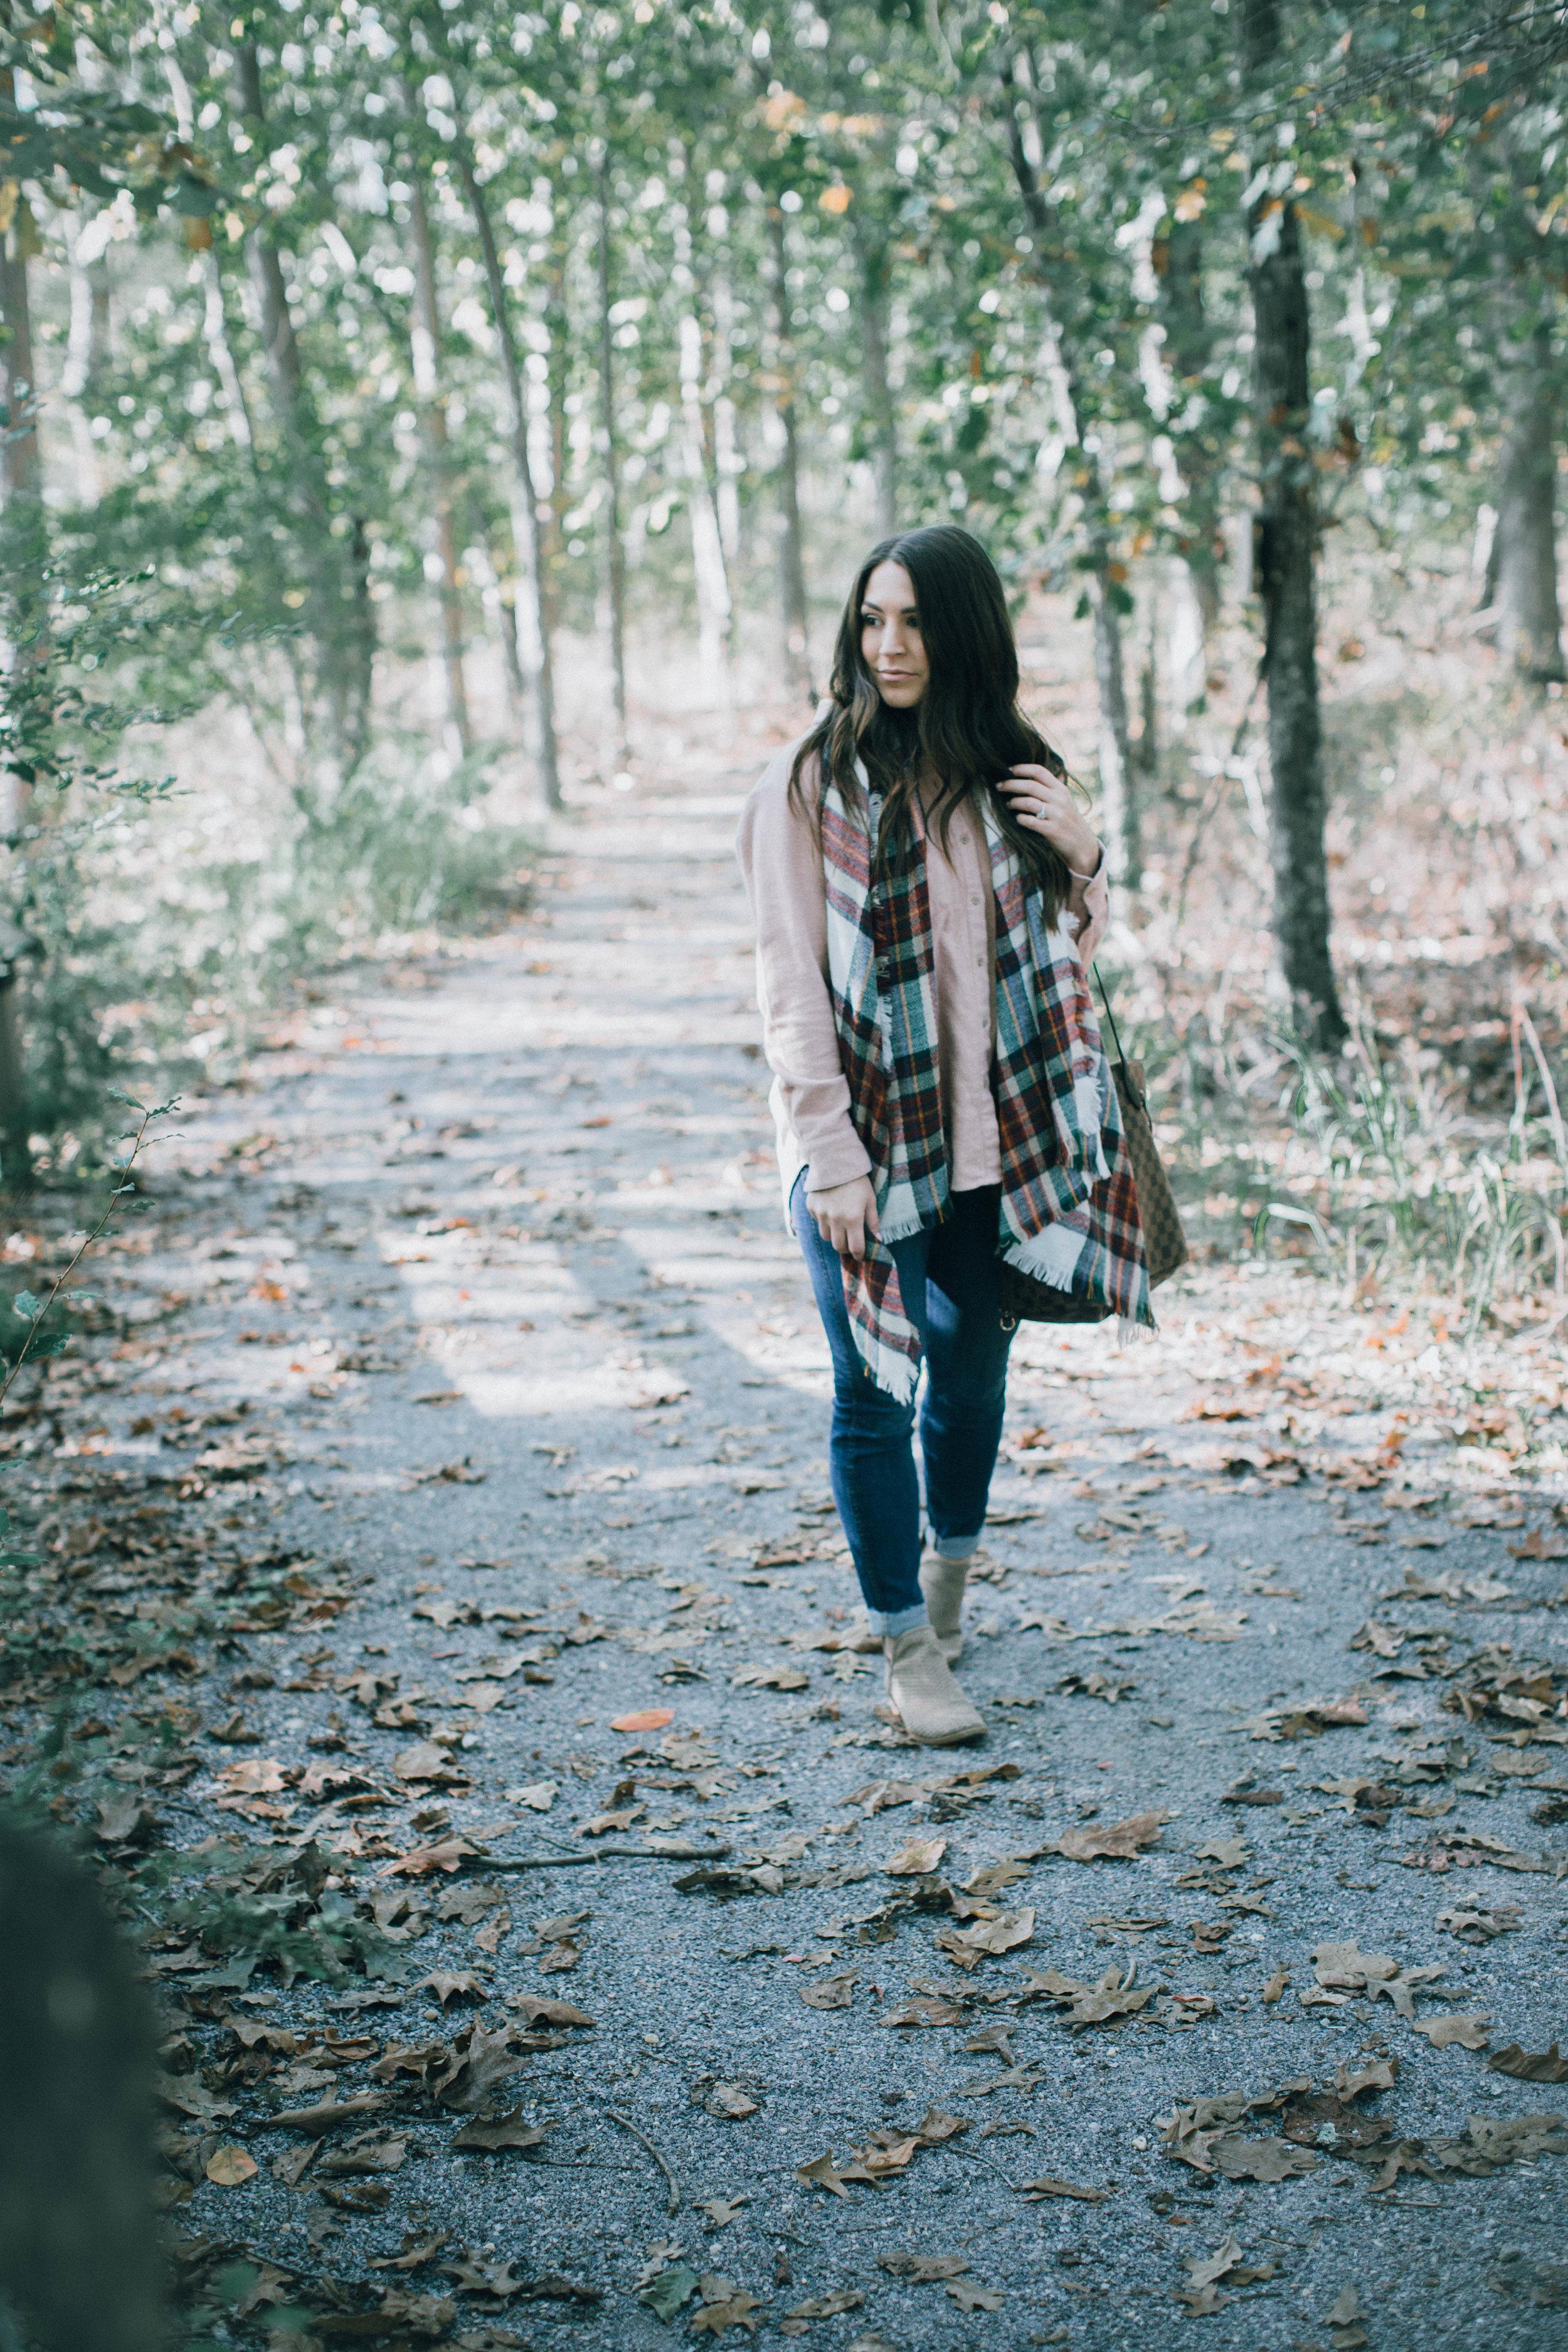 styling blush for fall / fall fashion / fall outfit idea / fall outfit inspiration / fall feels / blush flannel / plaid blanket scarf